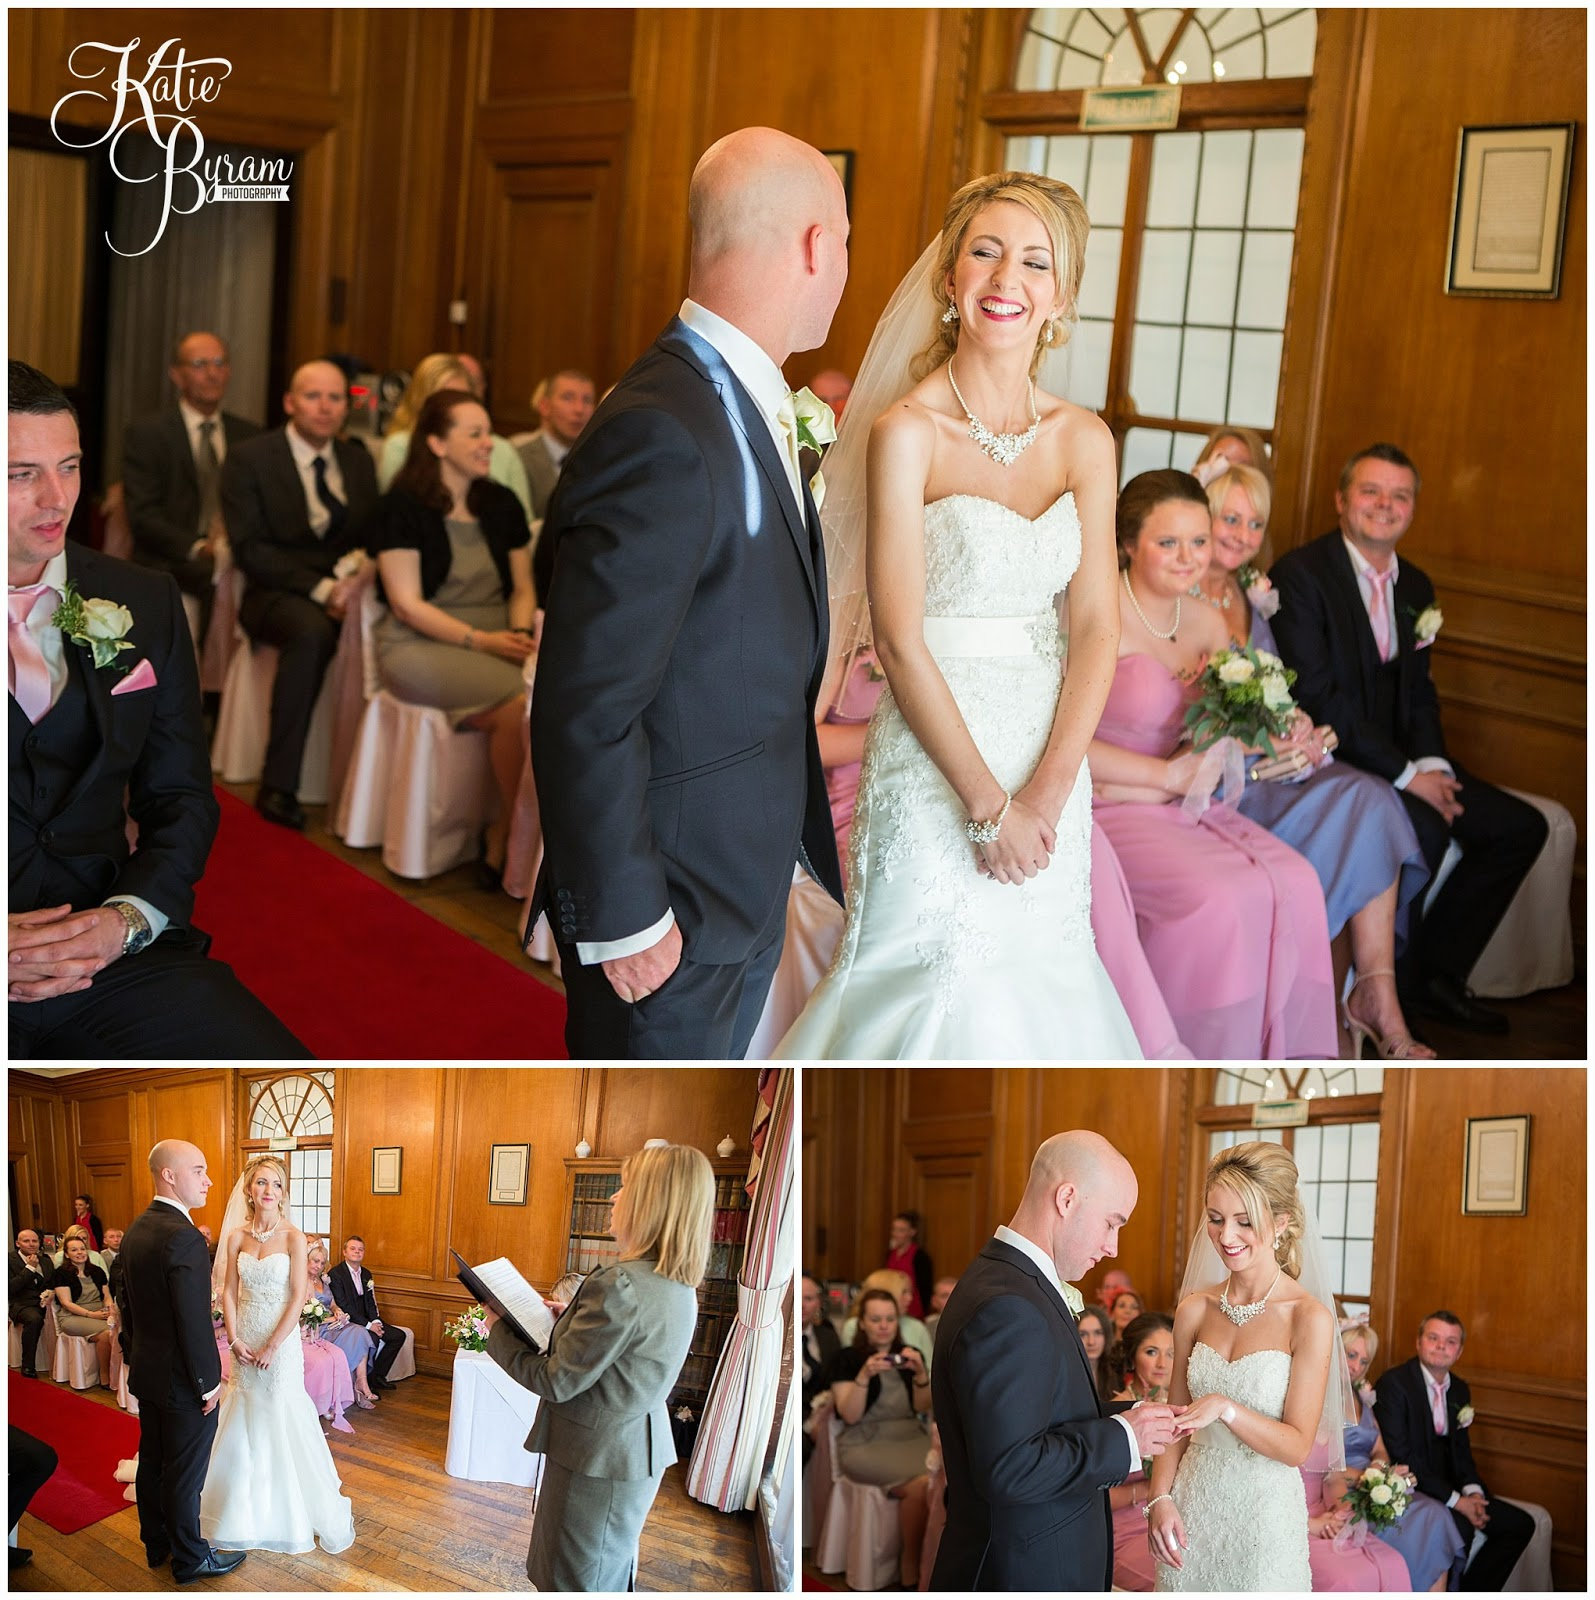 kirkley hall wedding, katie byram photography